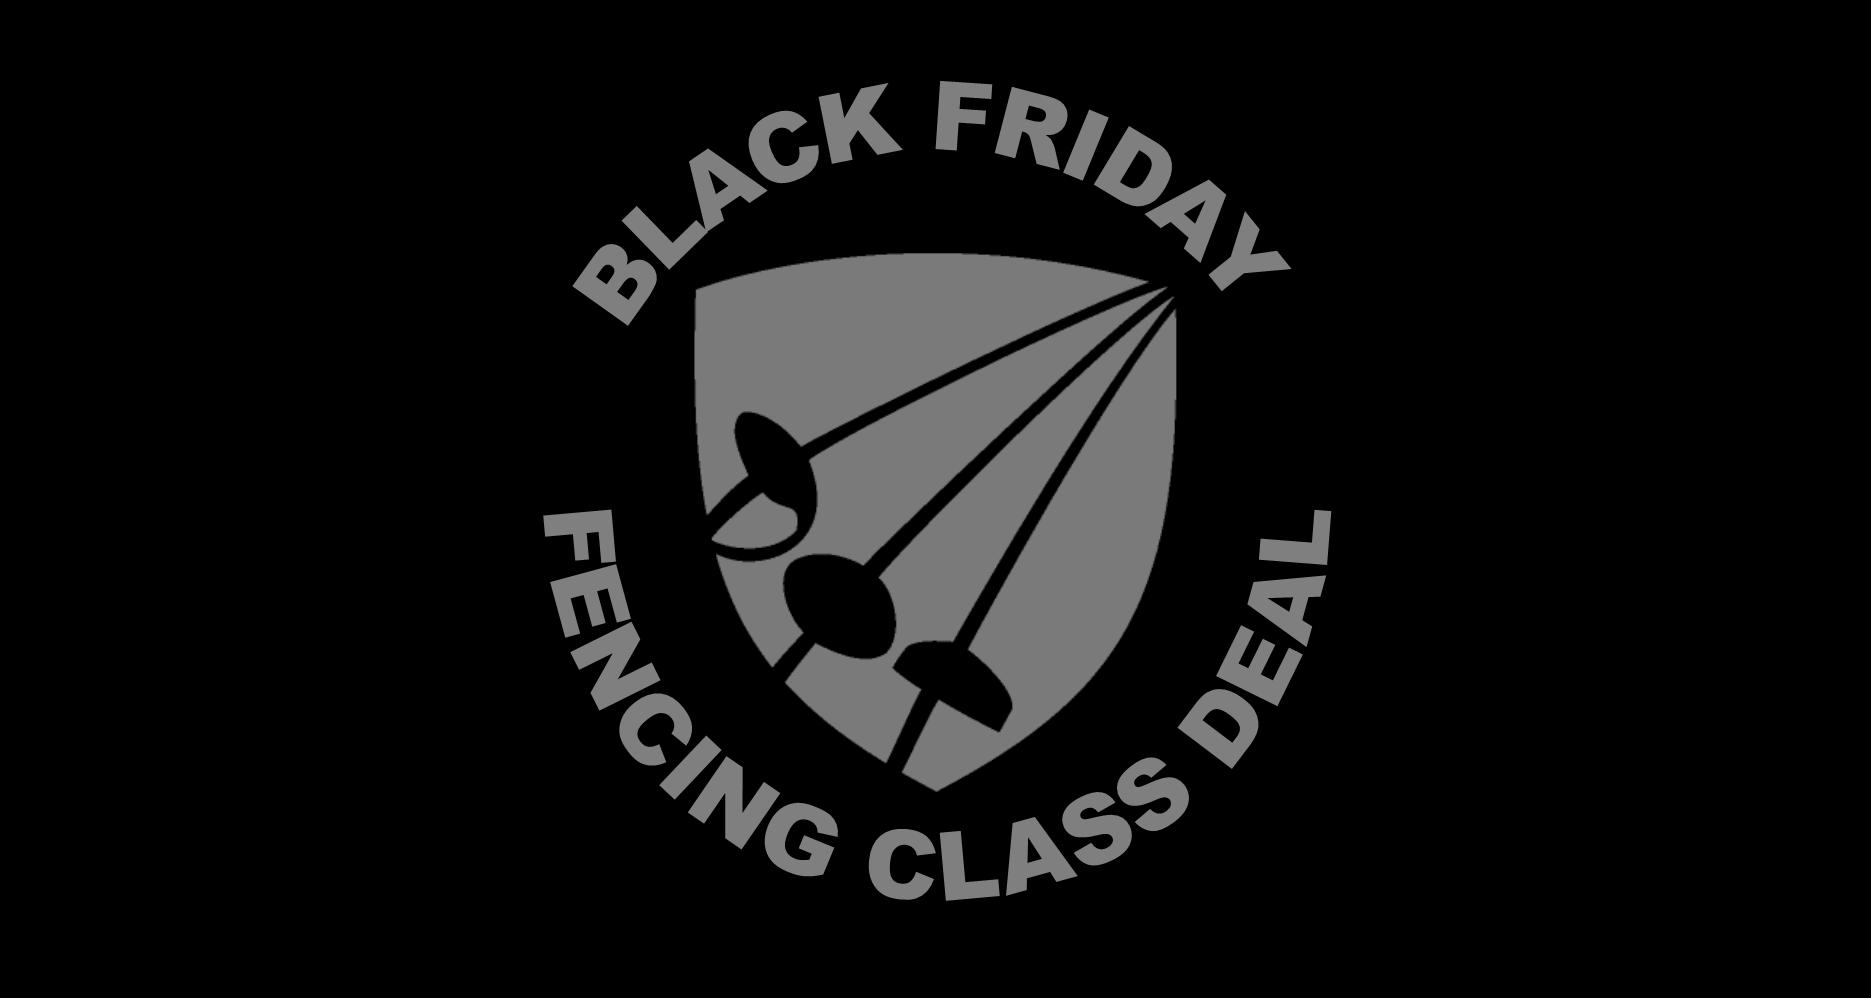 blackfridayfencingclassdealbanner